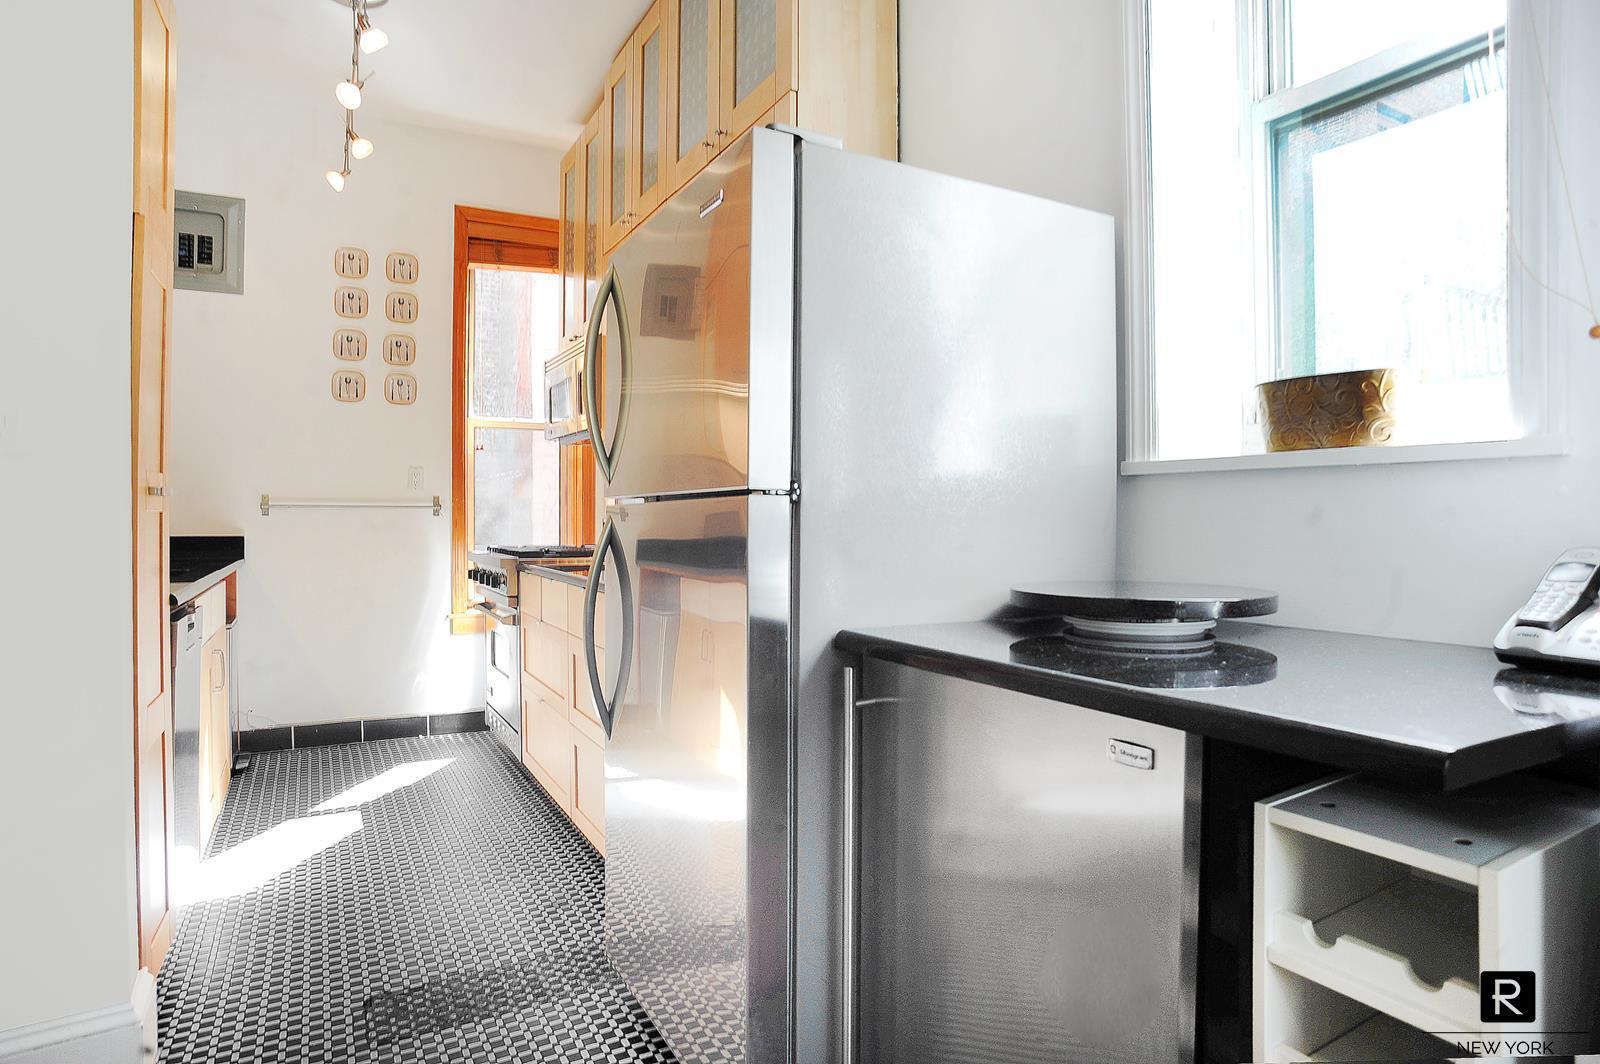 31 West 10th Street Greenwich Village New York NY 10011